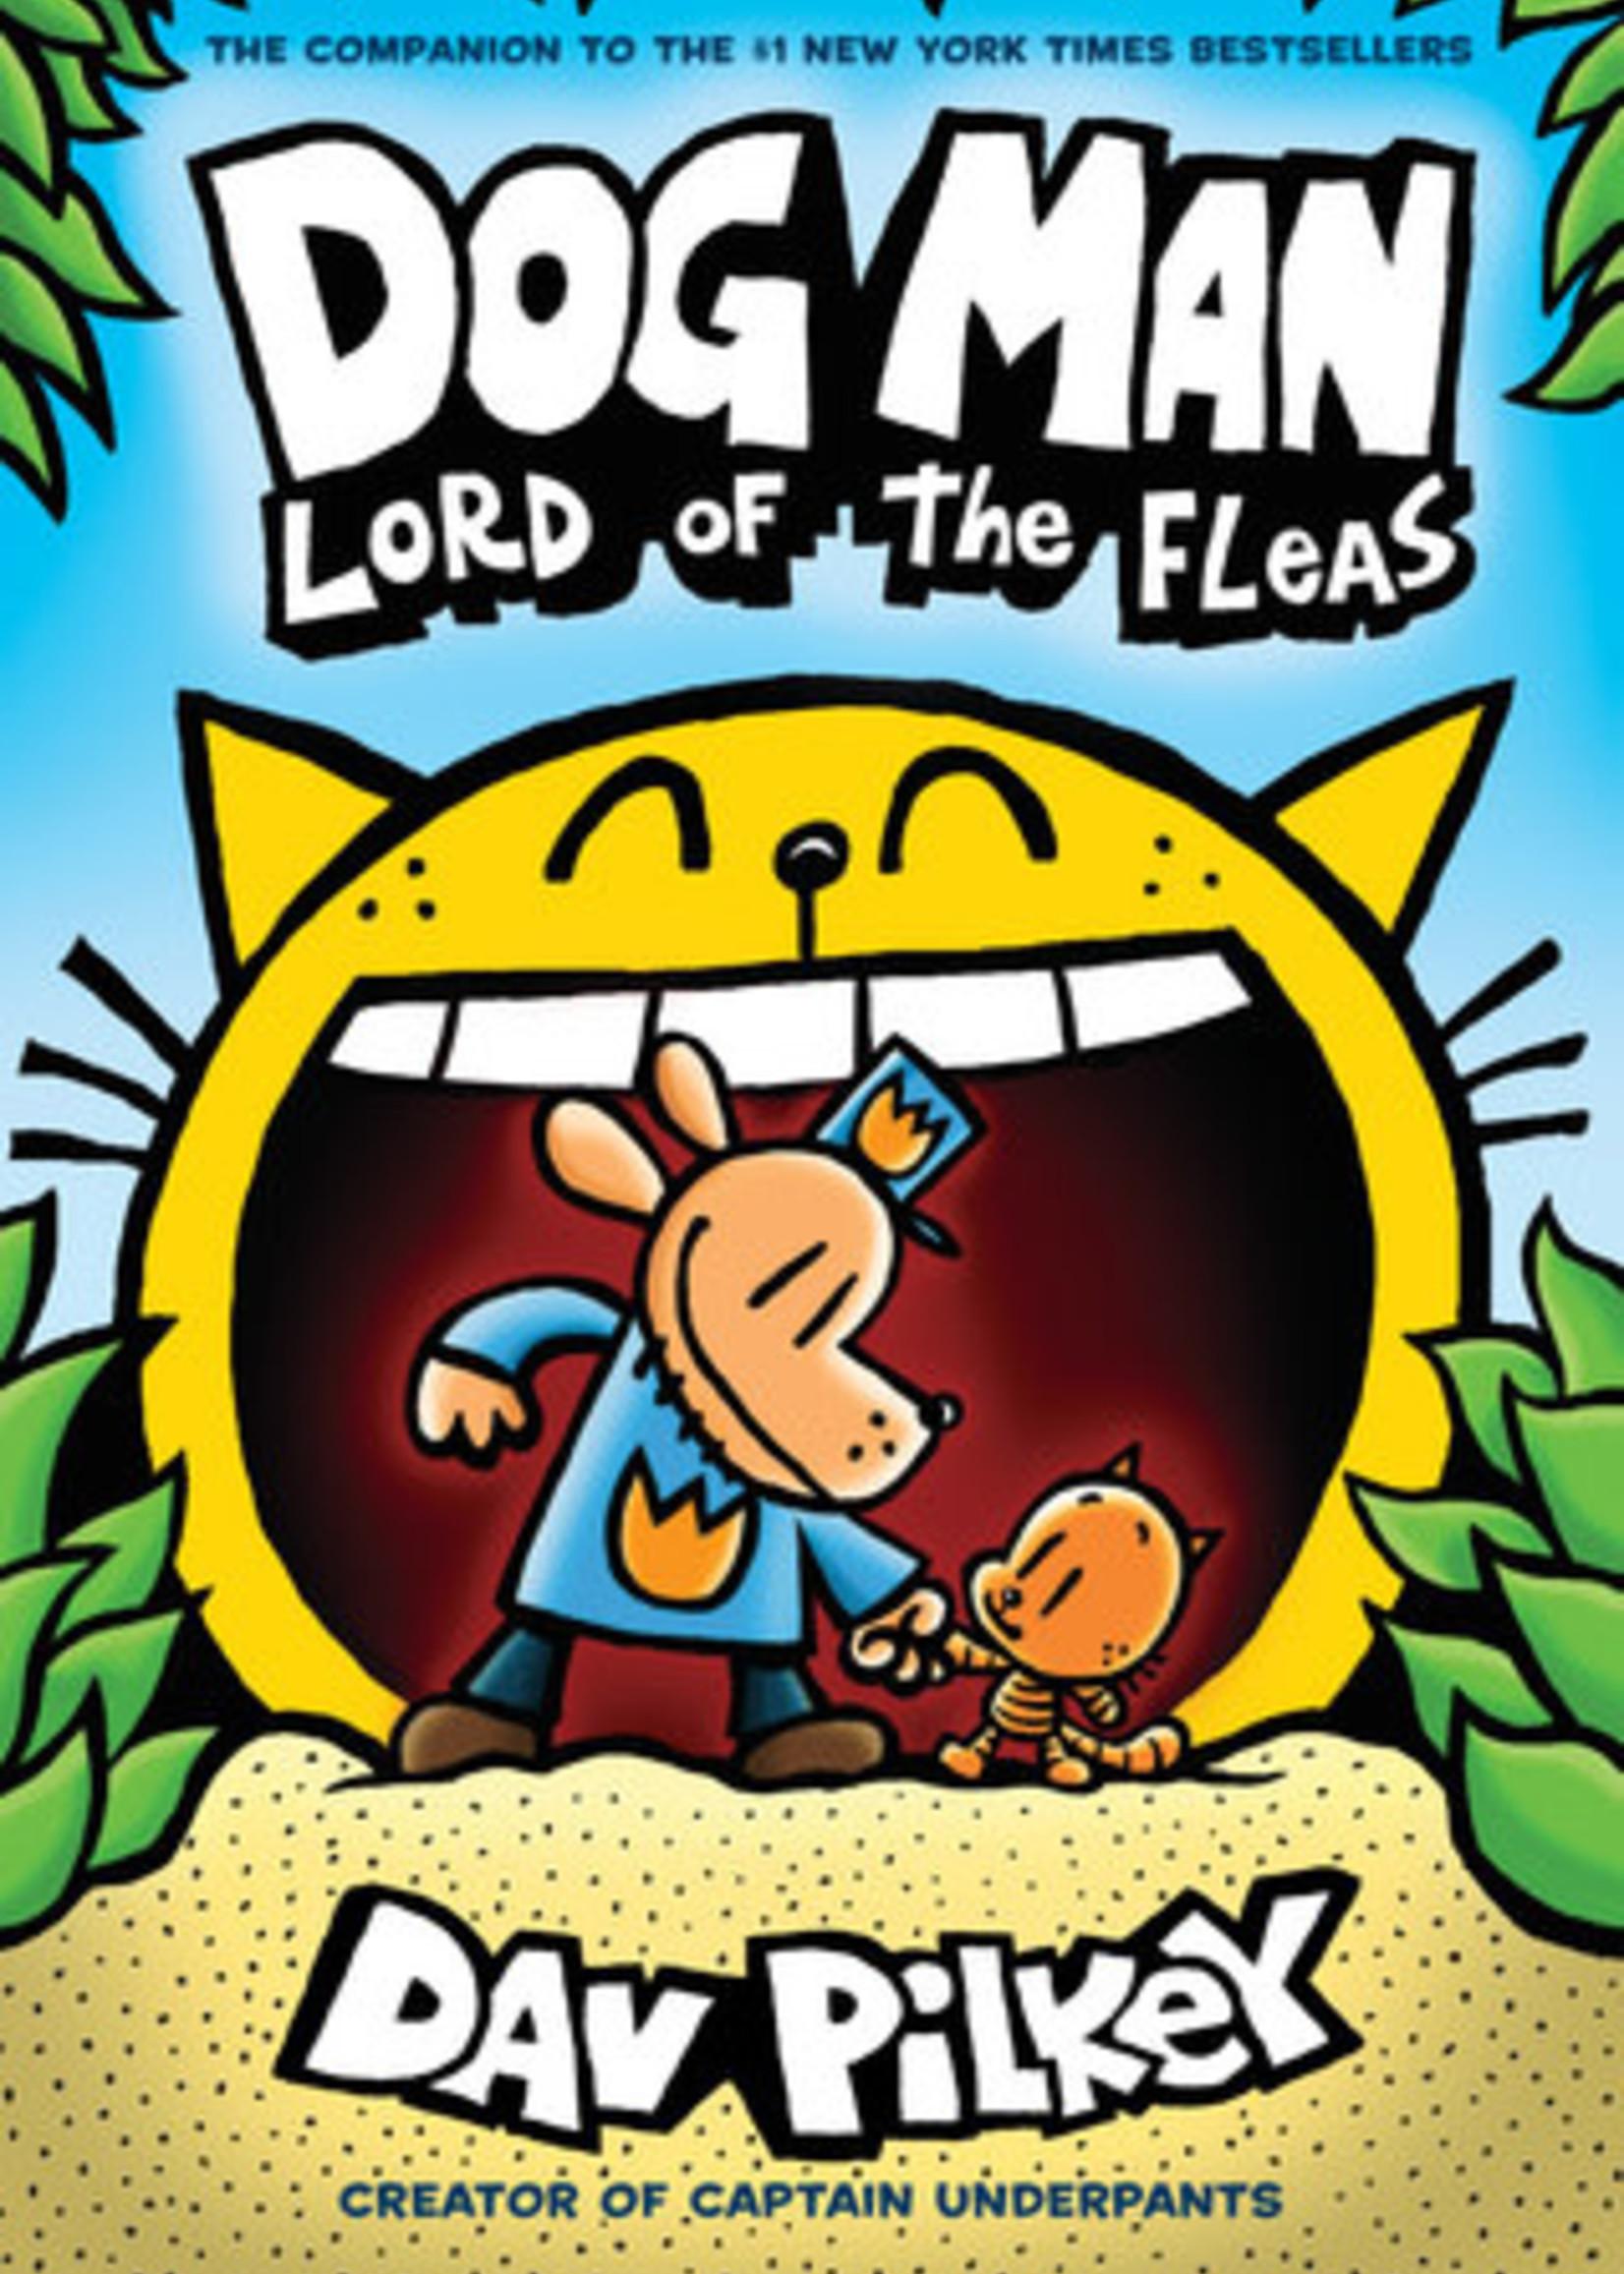 Dog Man: Lord of the Fleas (Dog Man #5) by Dav Pilkey